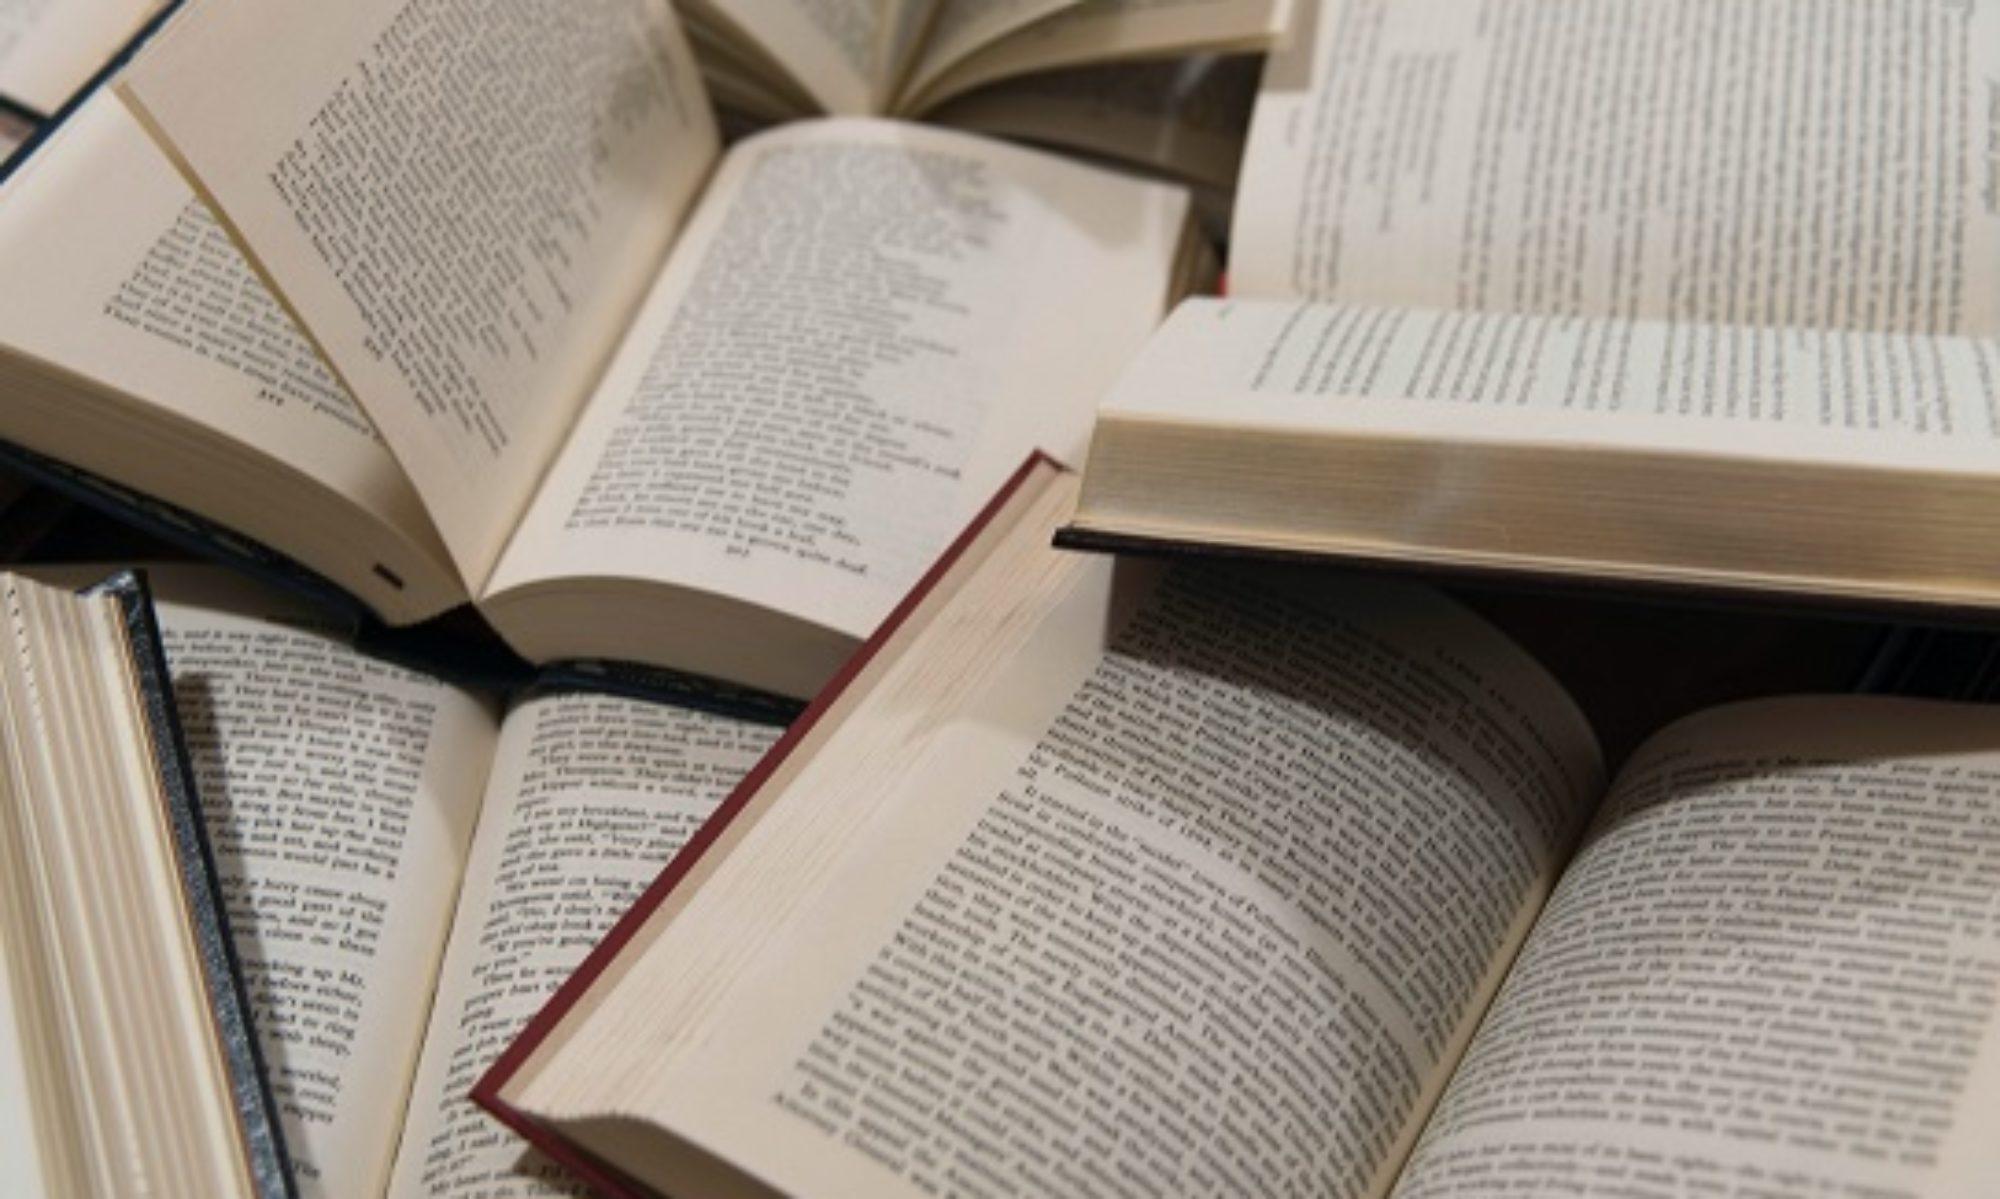 The Herts Book Binder